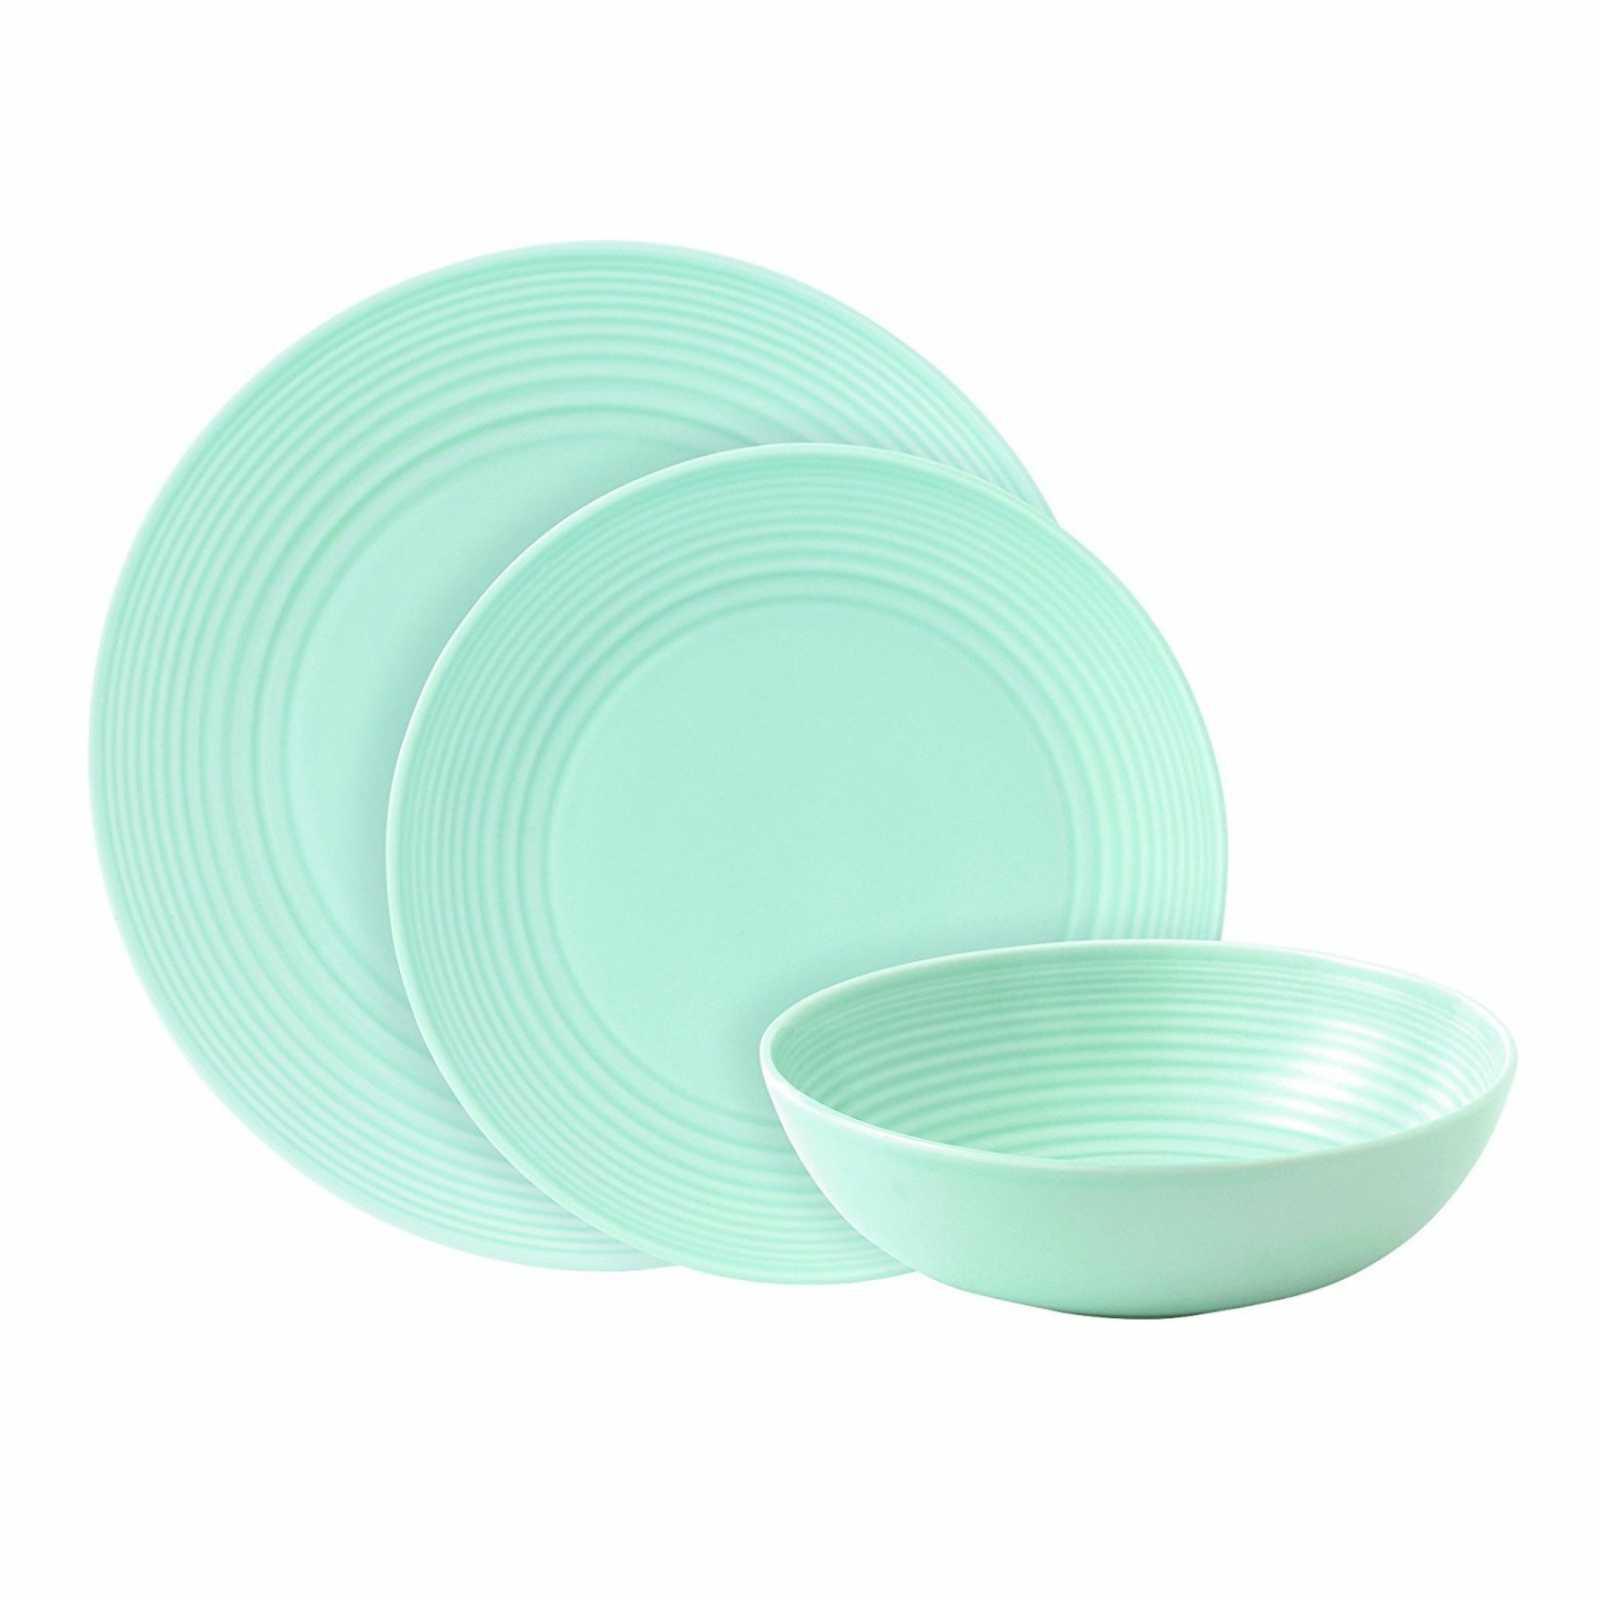 Онлайн каталог PROMENU: Набор столовой посуды Royal Doulton, 12 предм.                                   GRMZBL22417